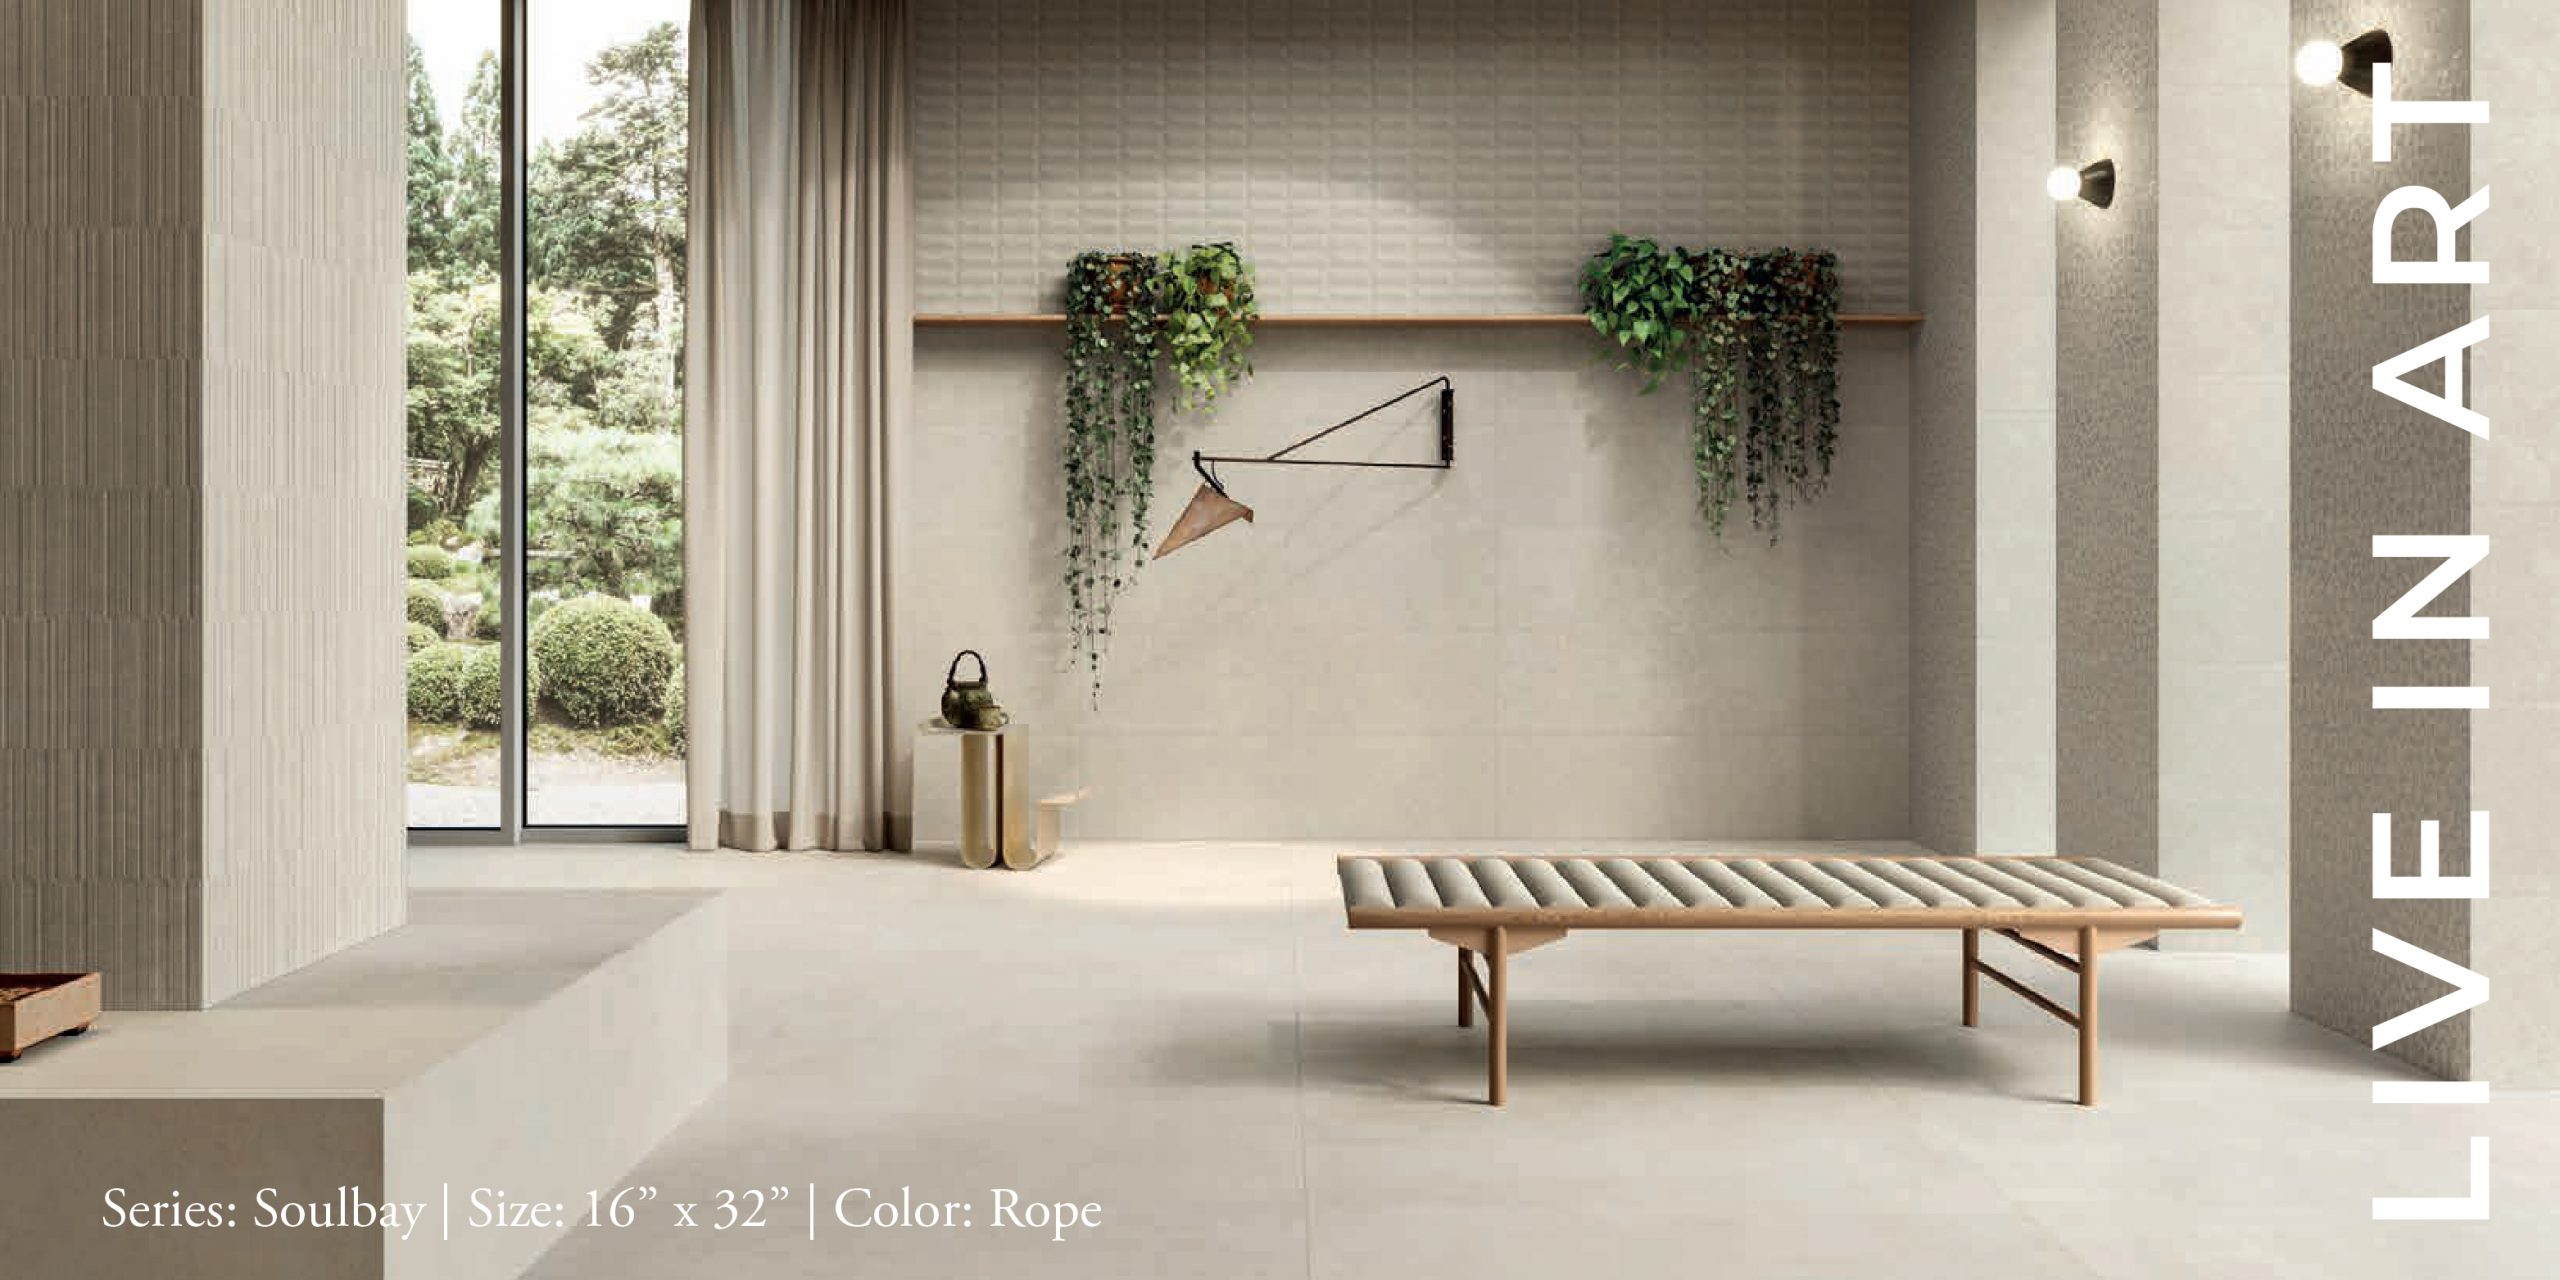 Soulbay Rope 16x32